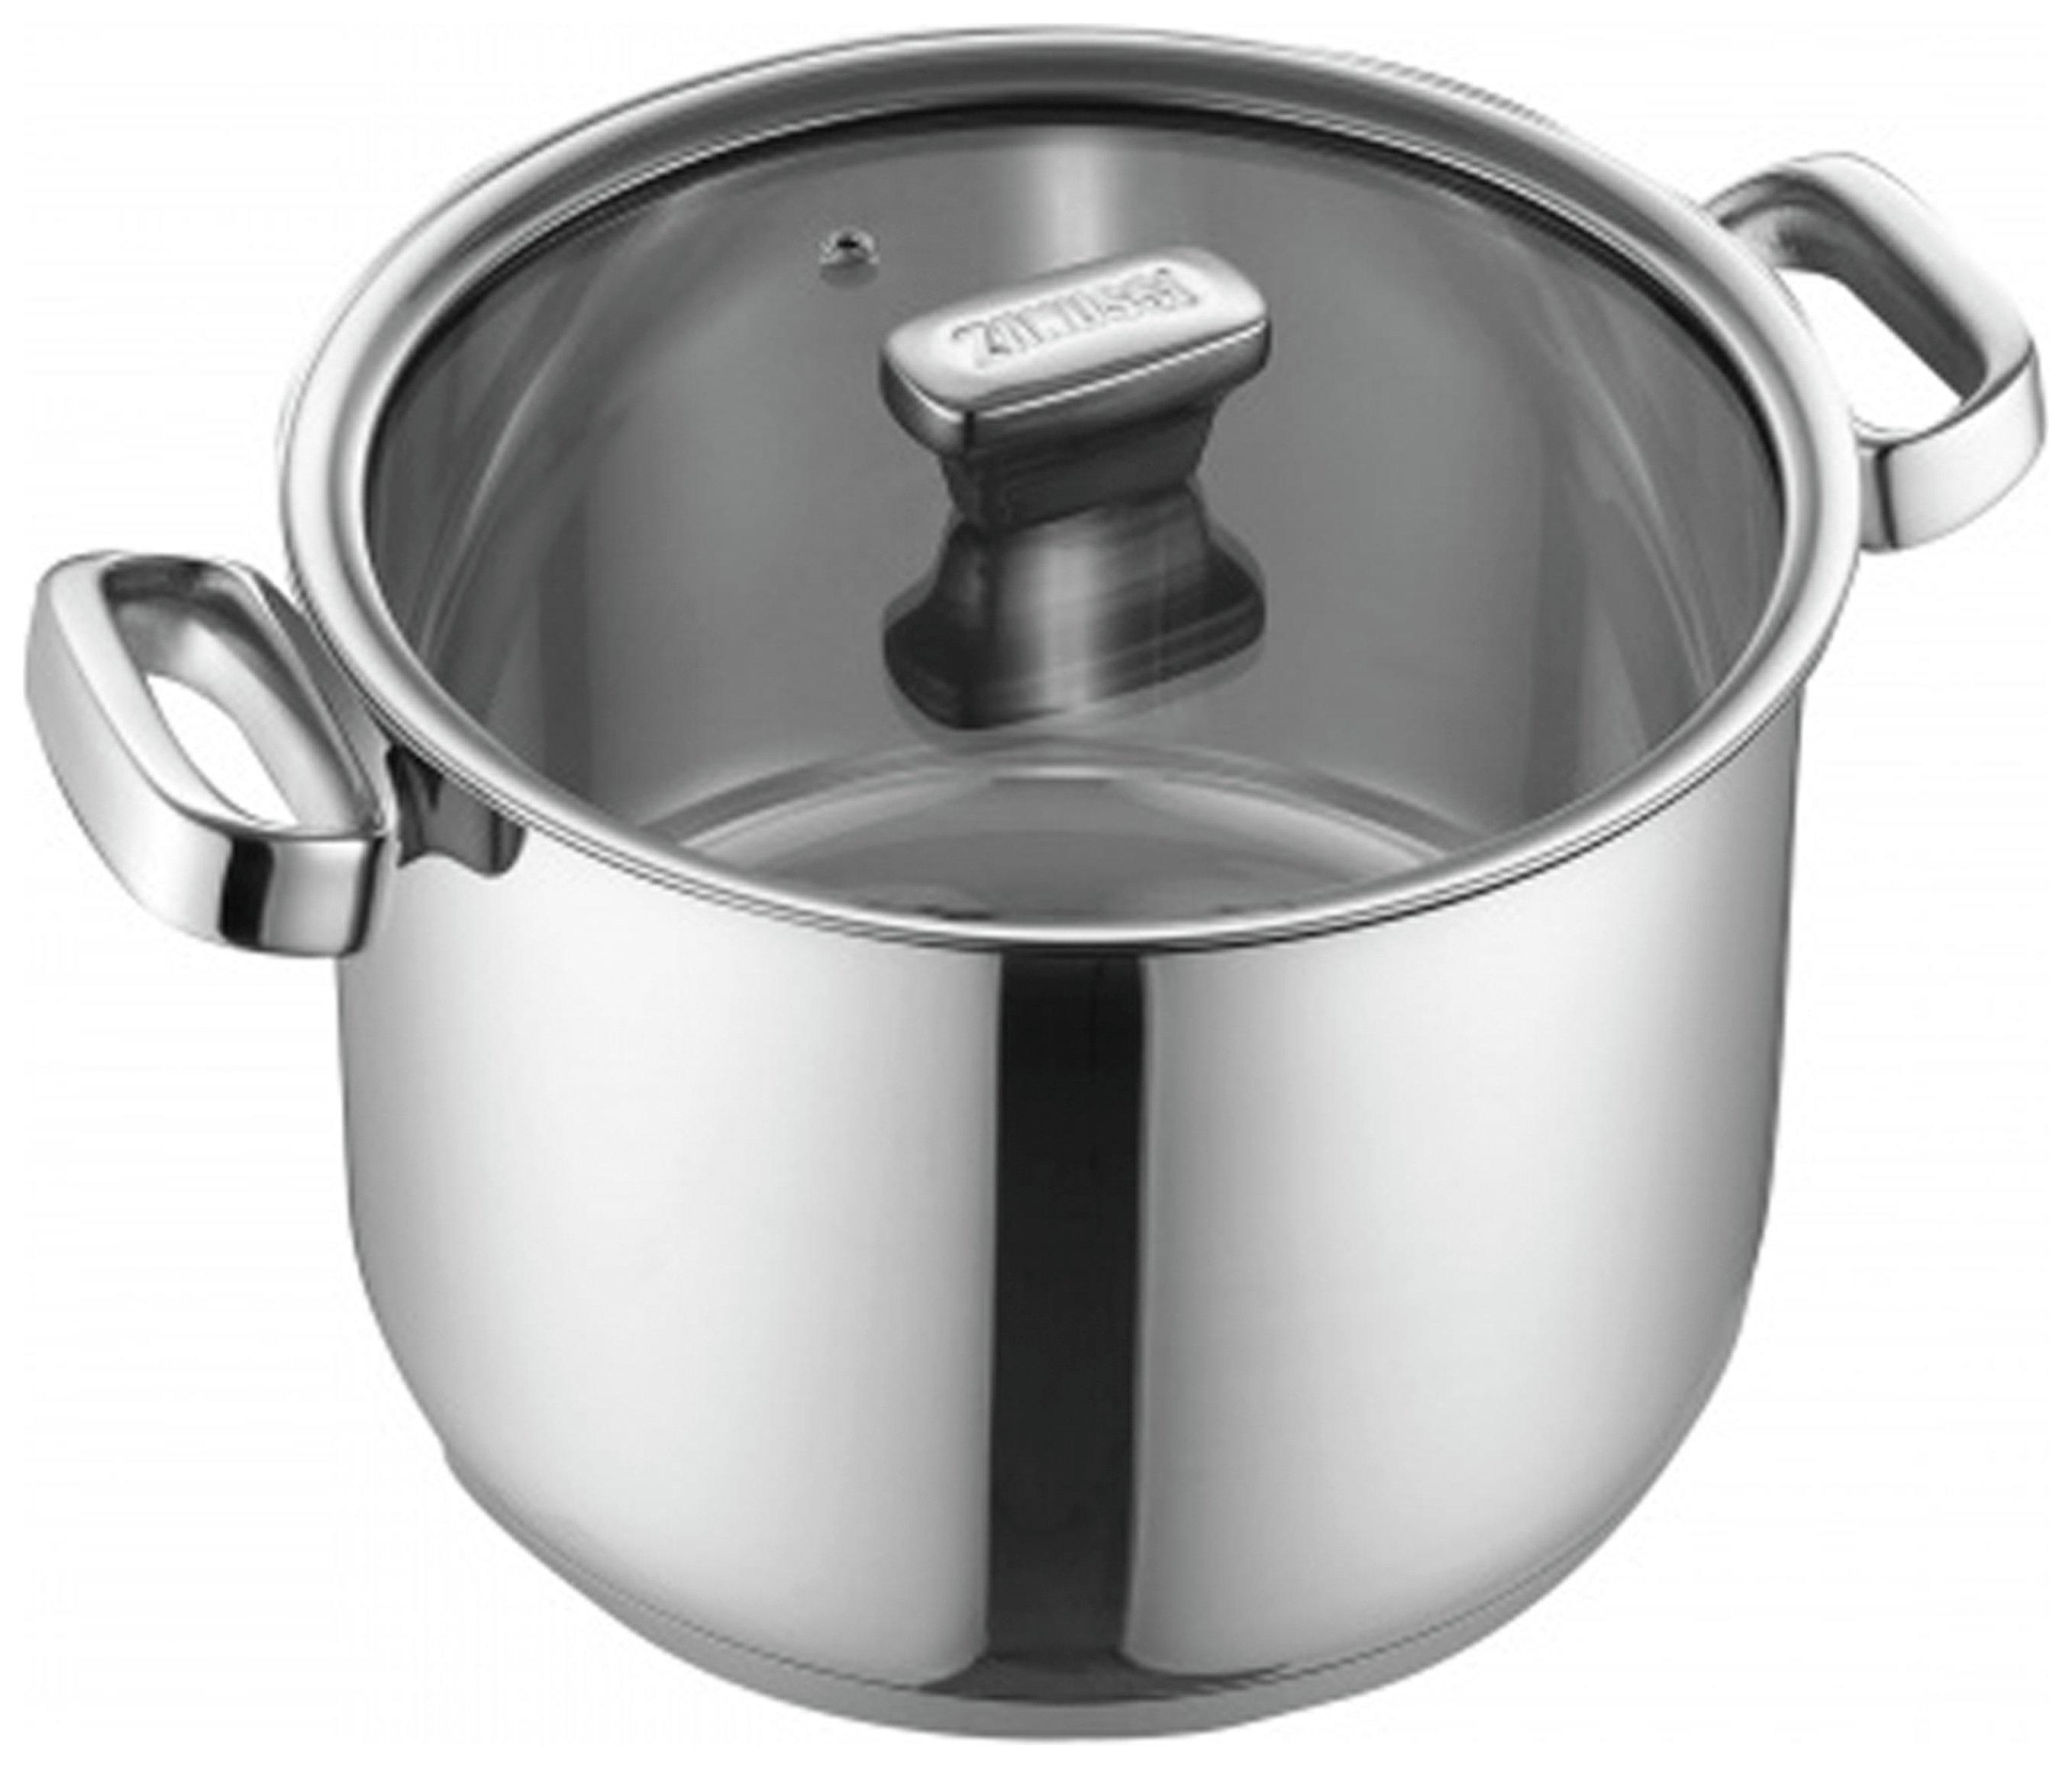 Zanussi Positano 24cm Stainless Steel Stock Pot with Lid